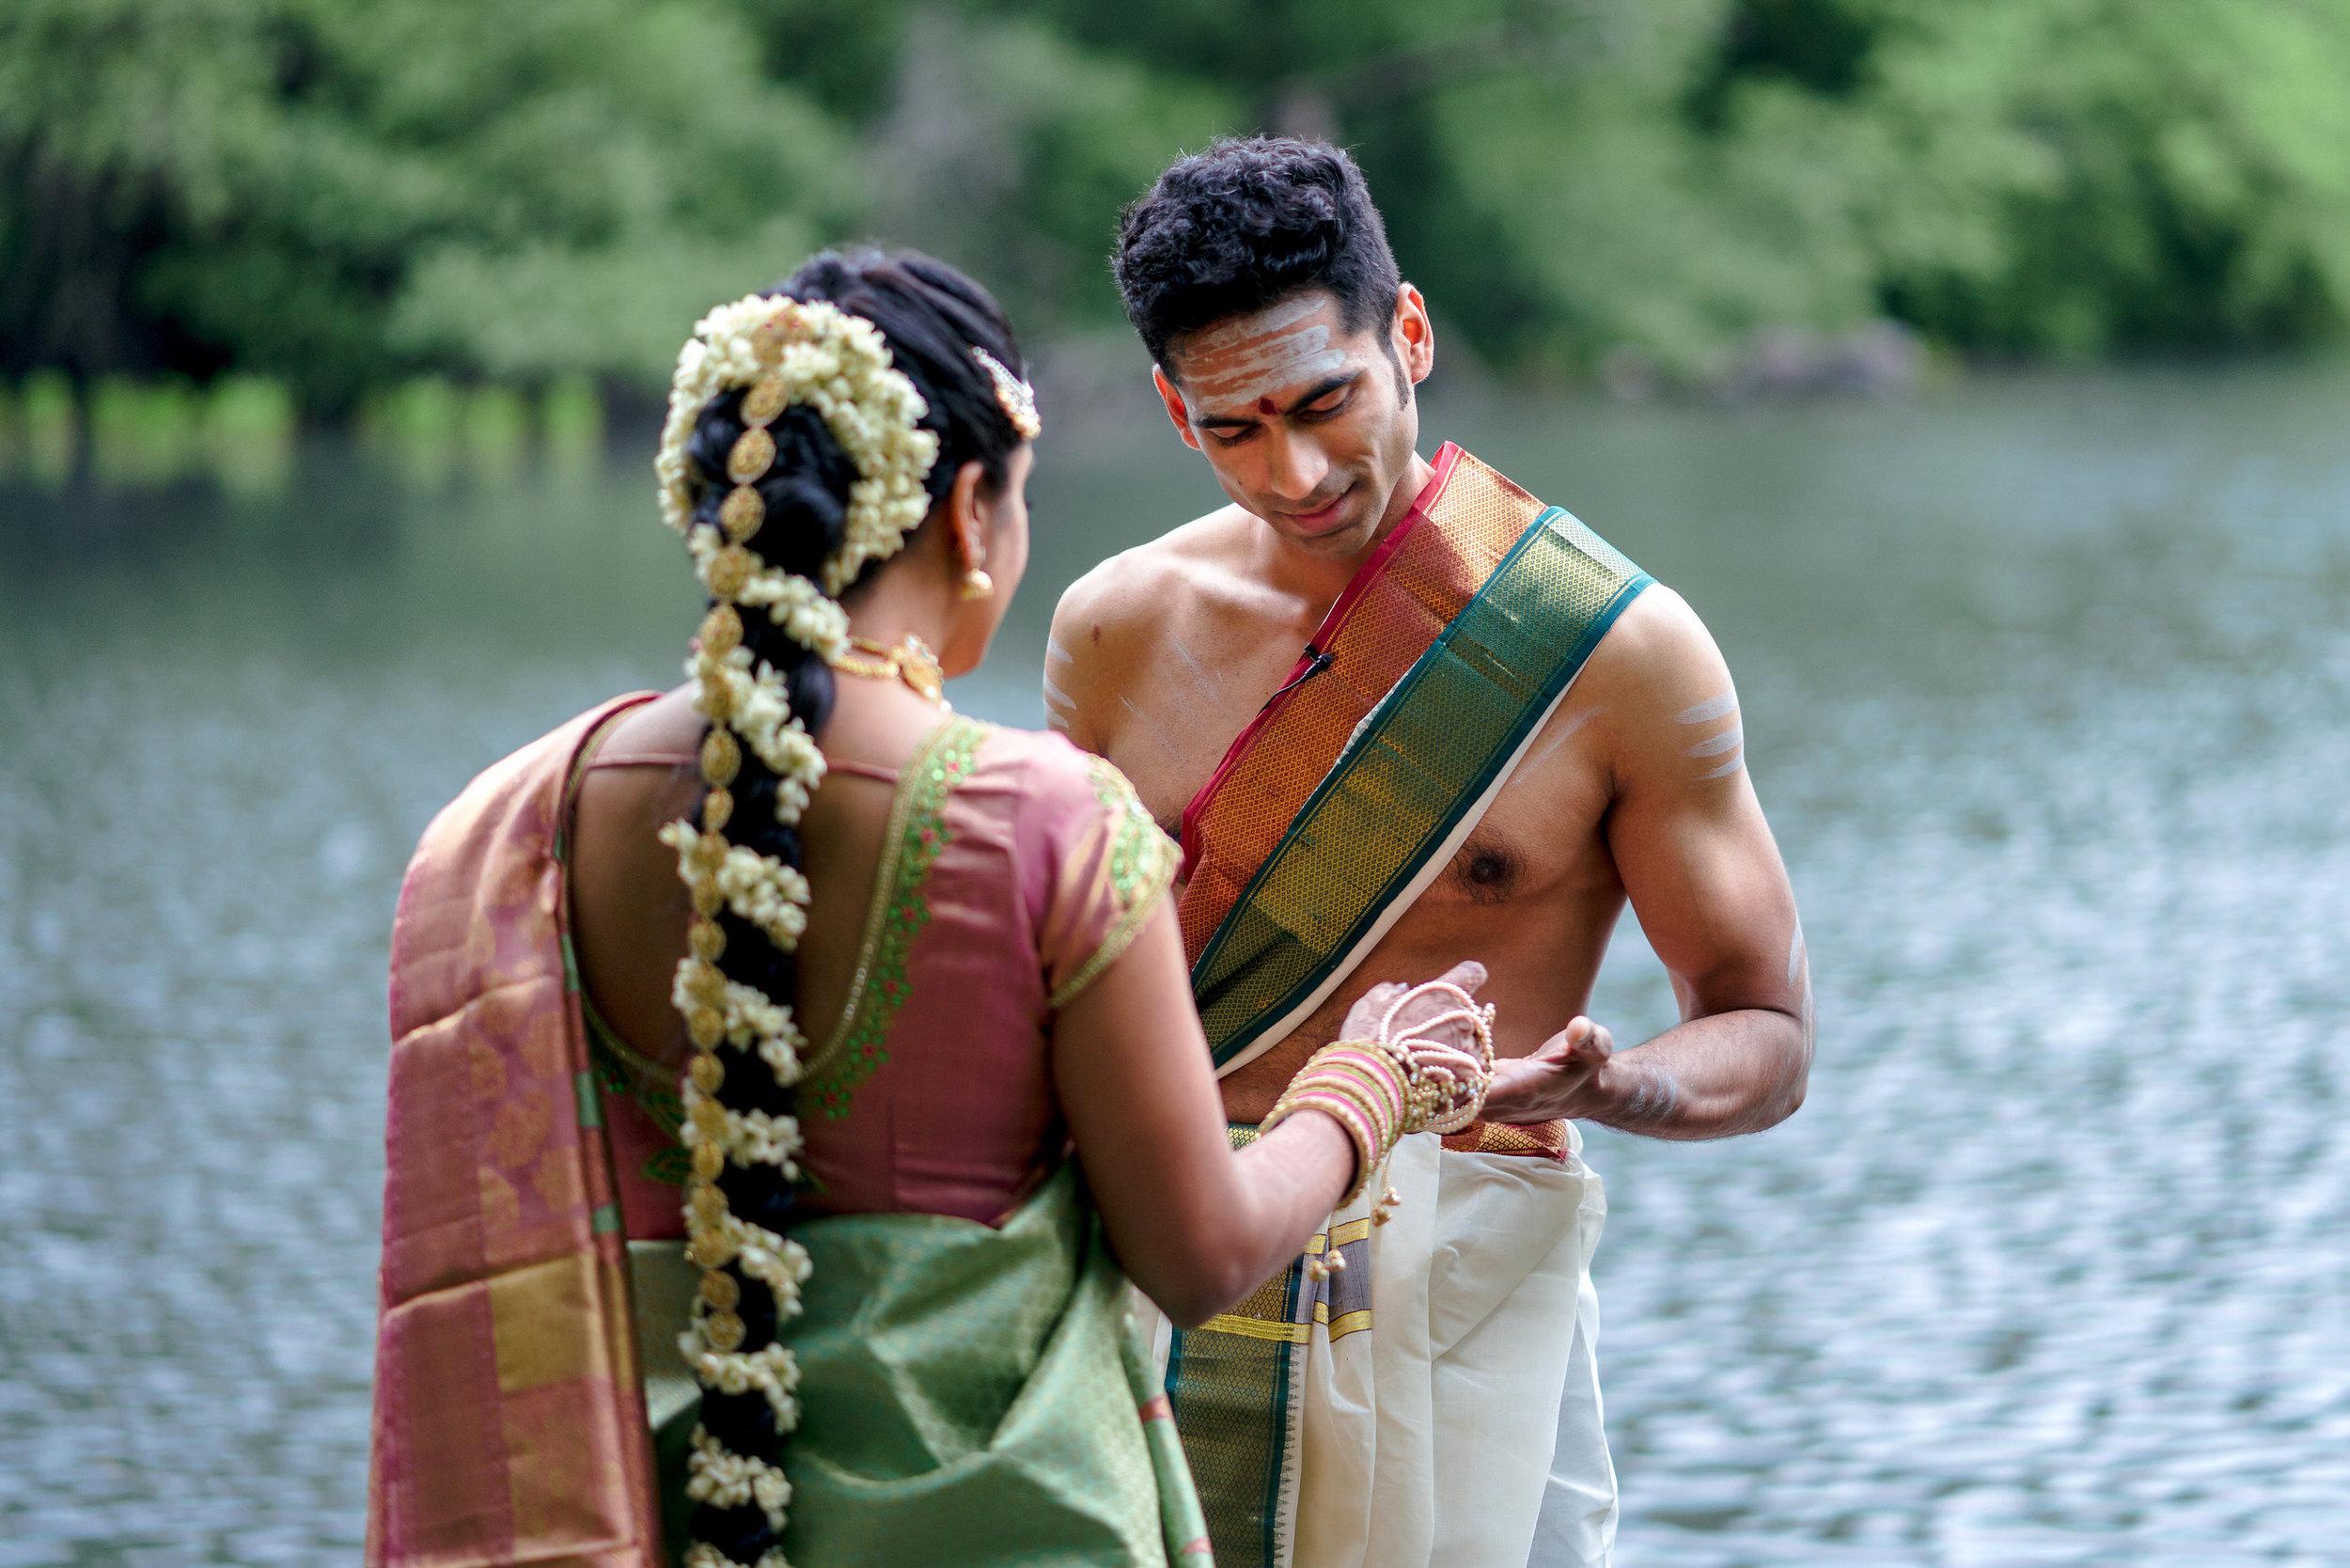 INDIAN WEDDING BRIDE AND GROOM WEDDING ATTIRE.JPG